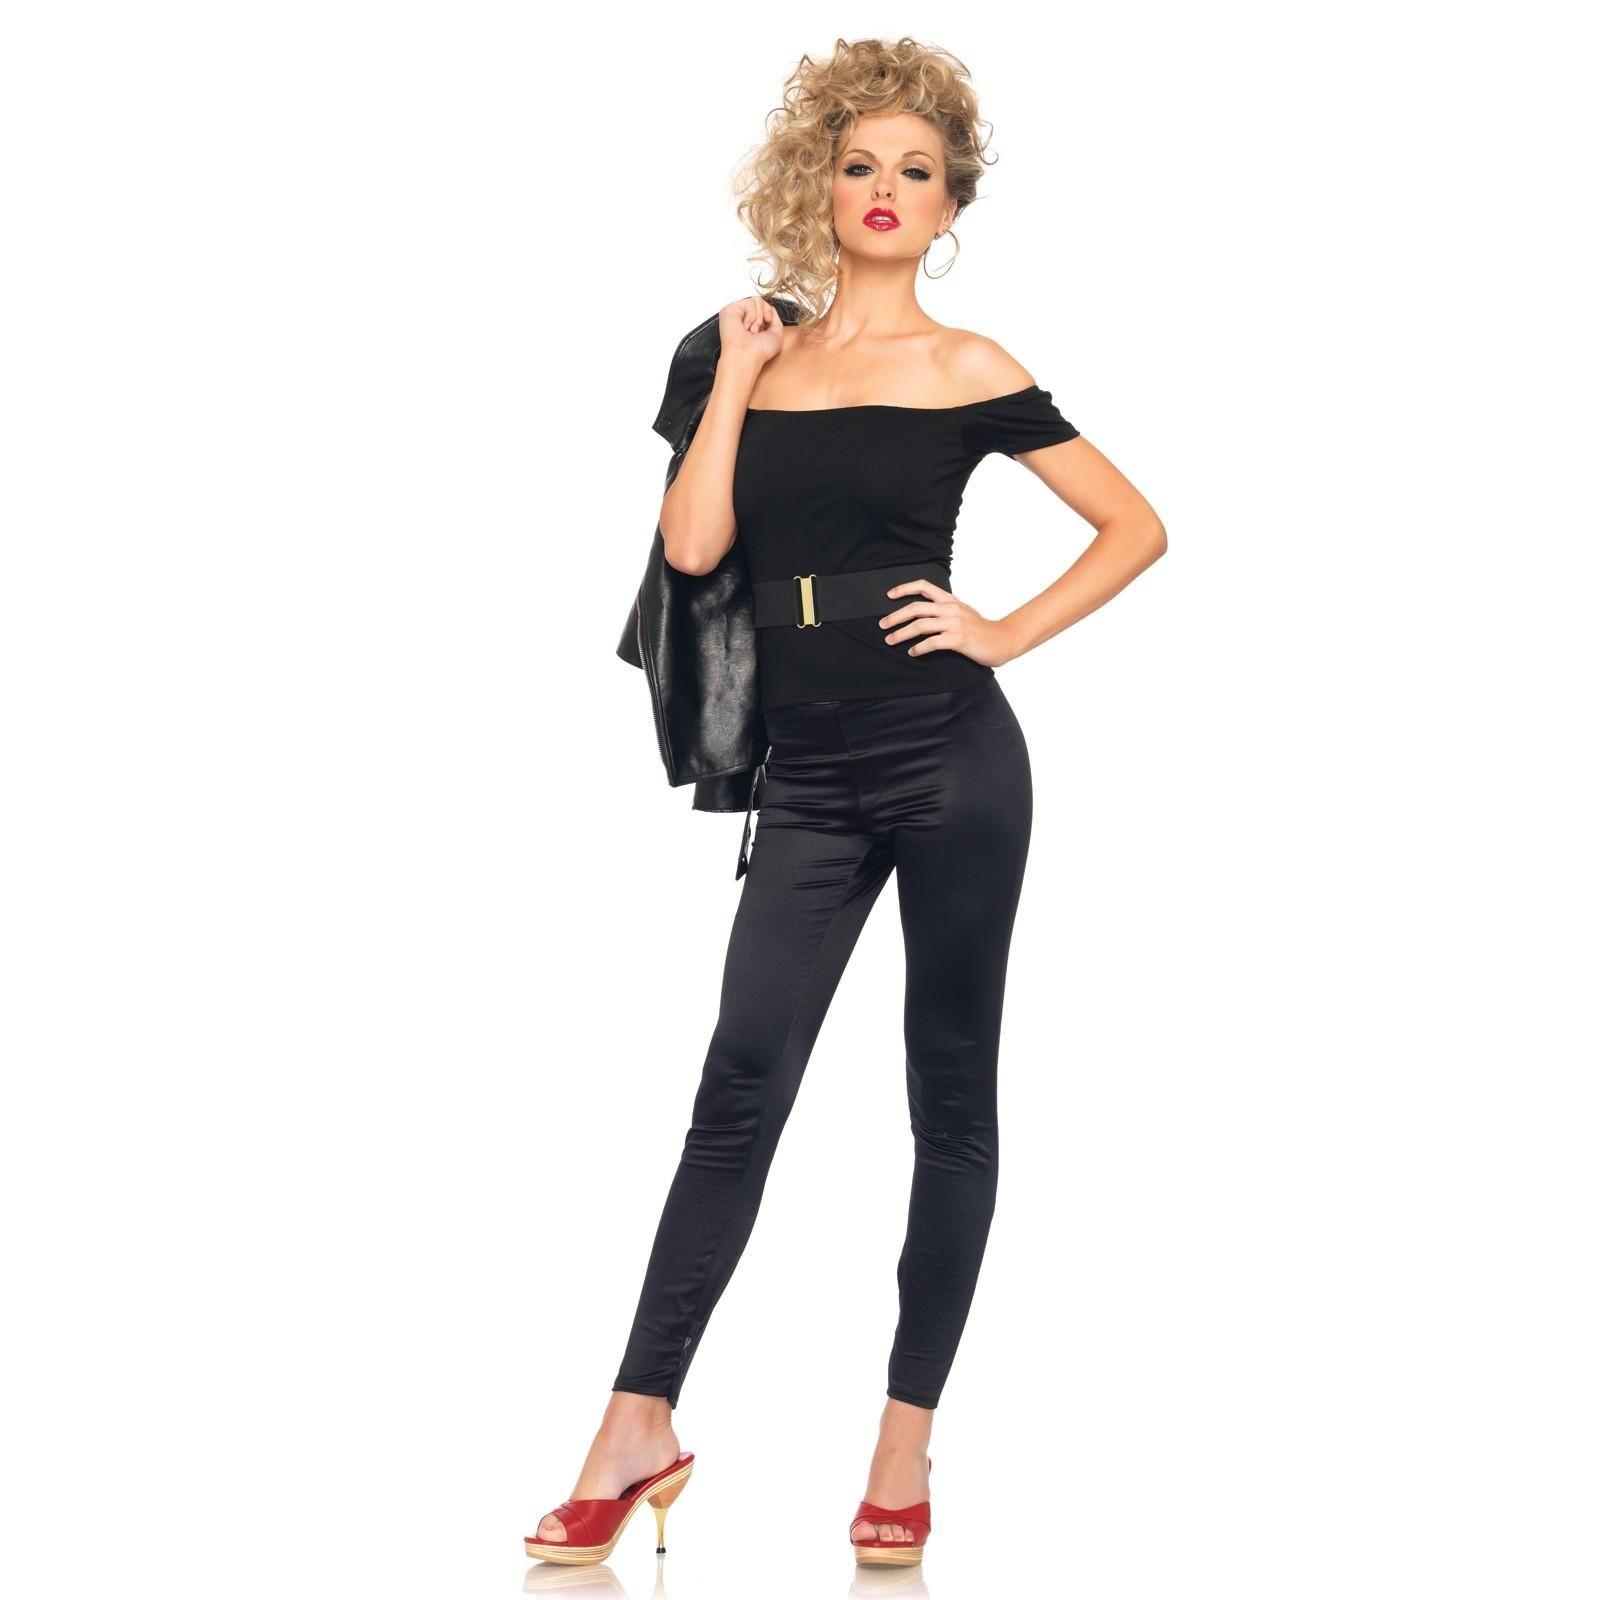 sandy grease costume - Google Search | halloween | Pinterest ...